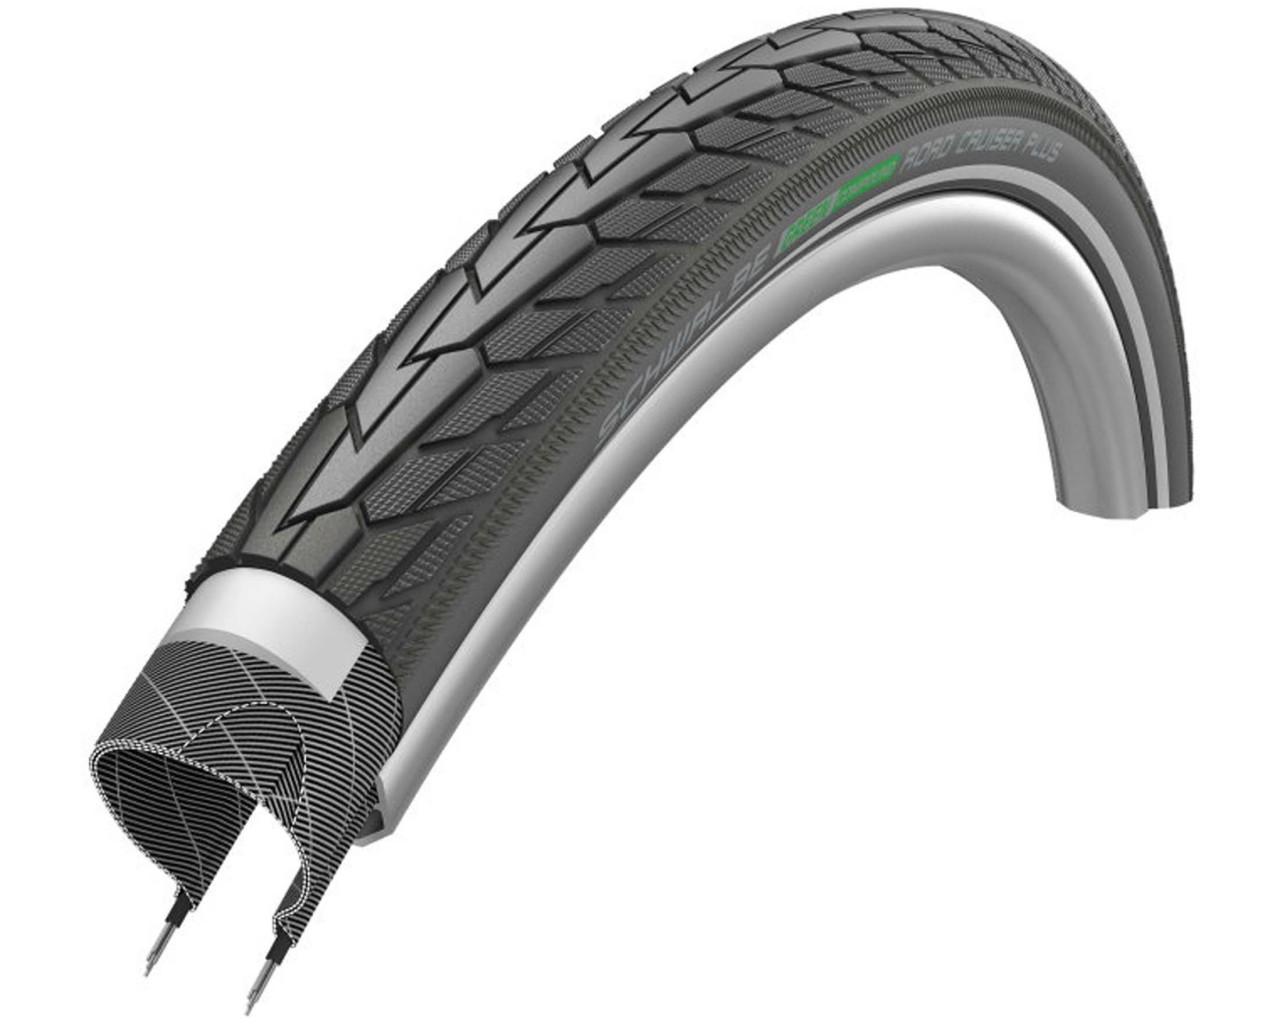 Schwalbe Road Cruiser Plus City/Touring-Tire 26x1.75 inch | black-reflex Green Compound Active Line Clincher